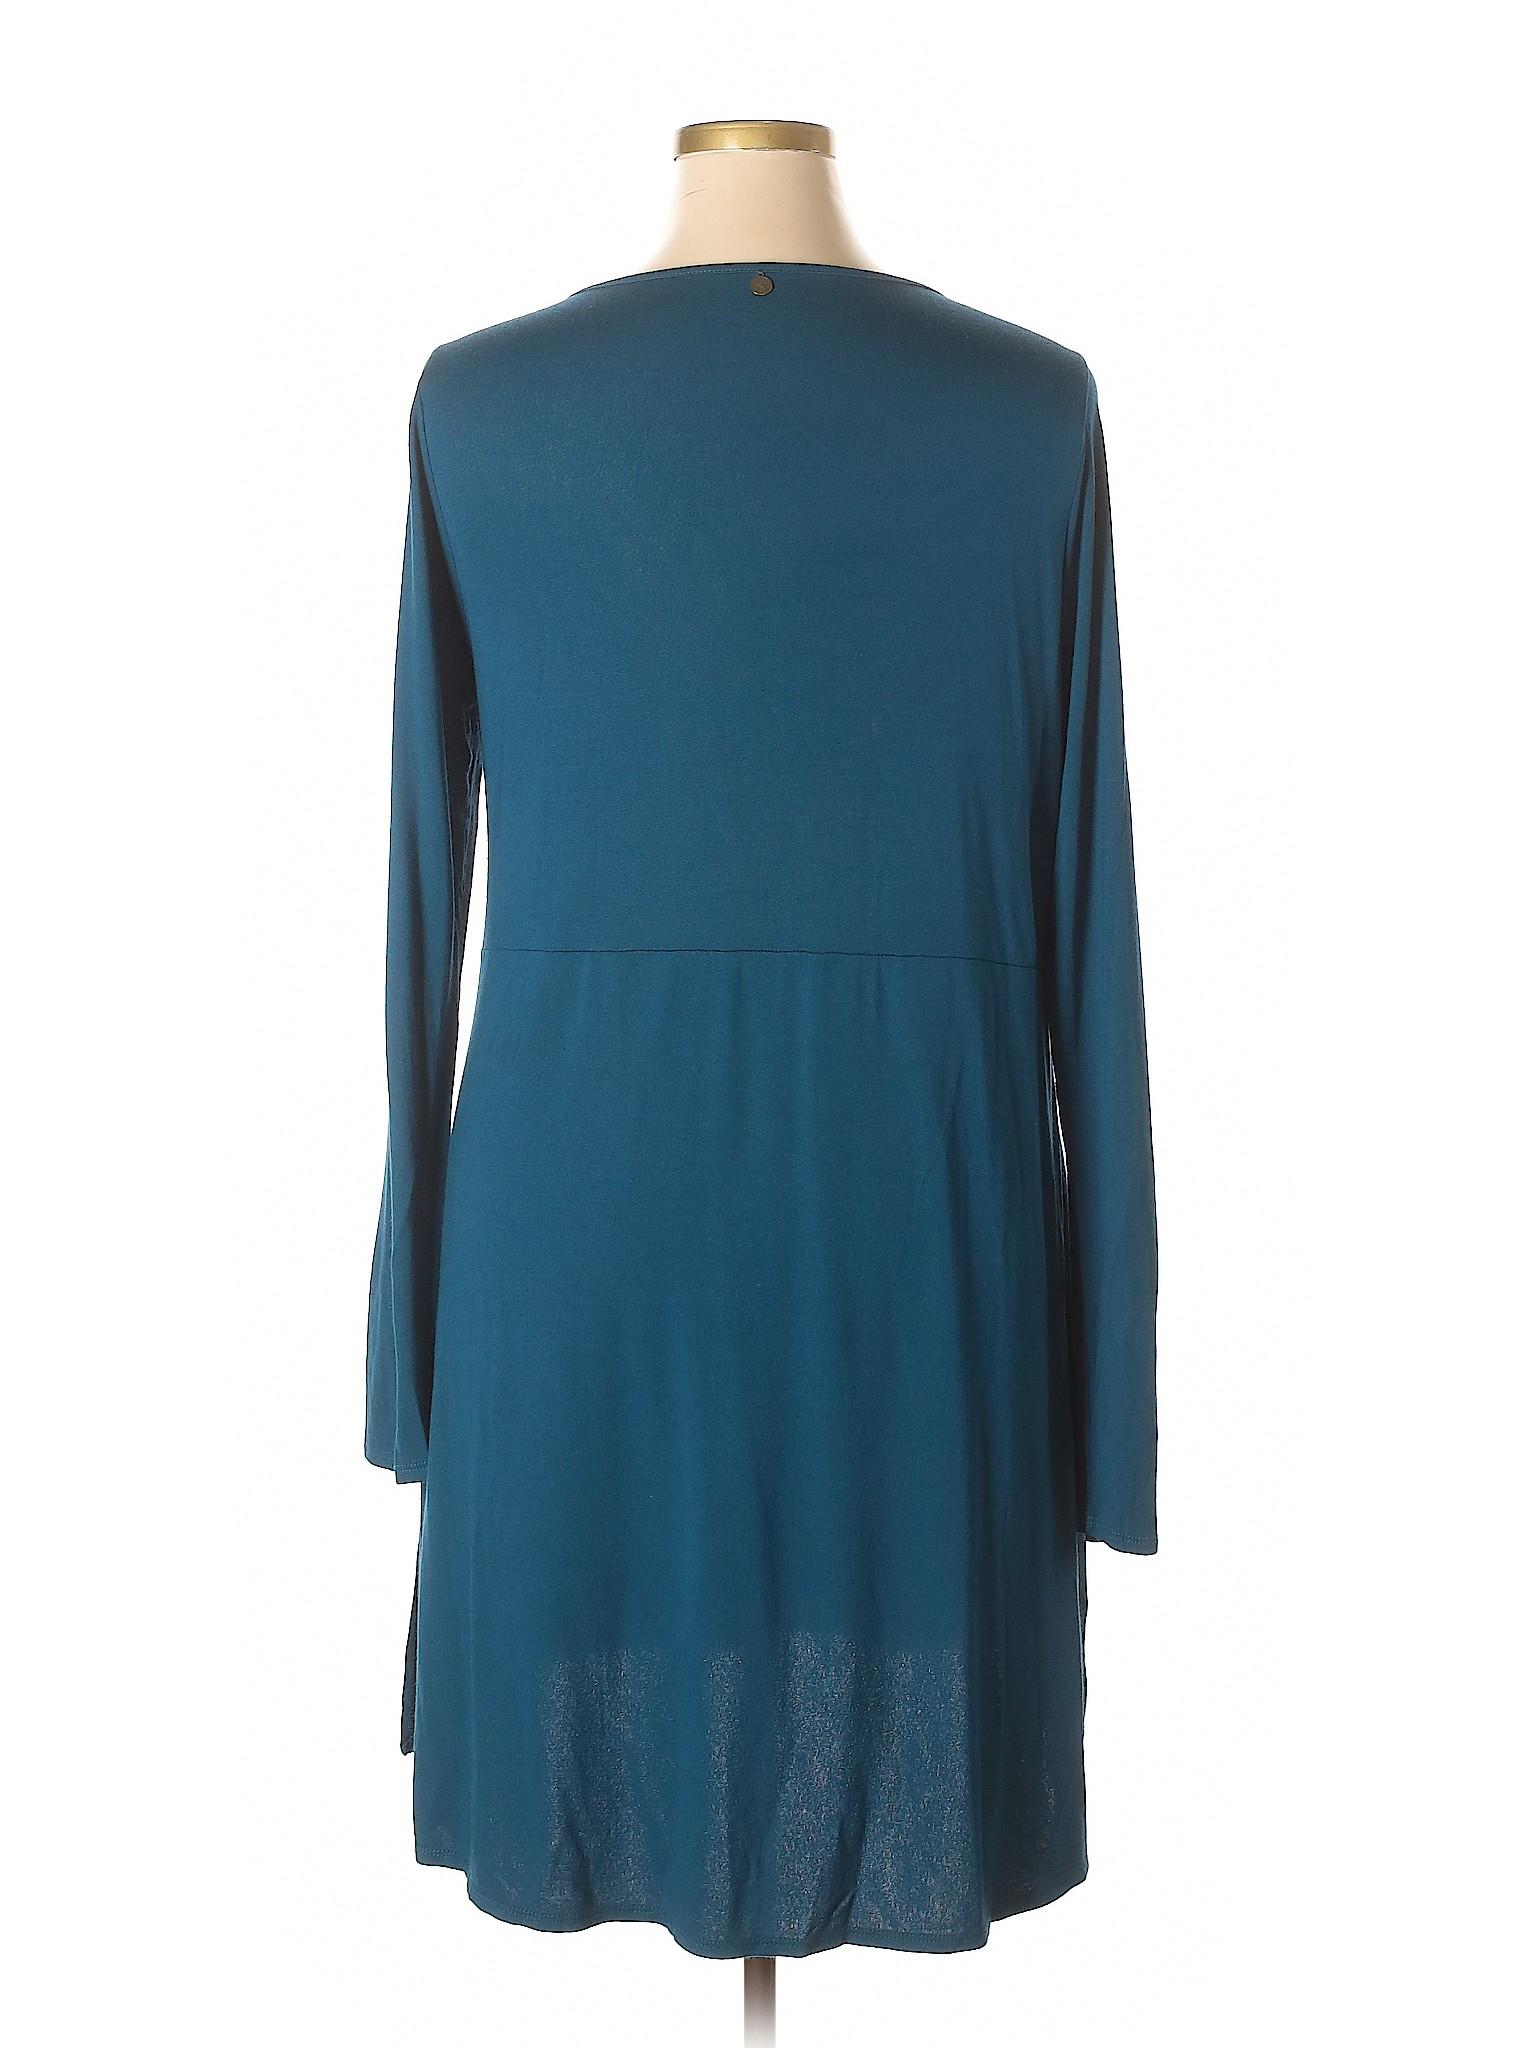 Boutique Dress Soft Casual winter Surroundings wqfwUgv